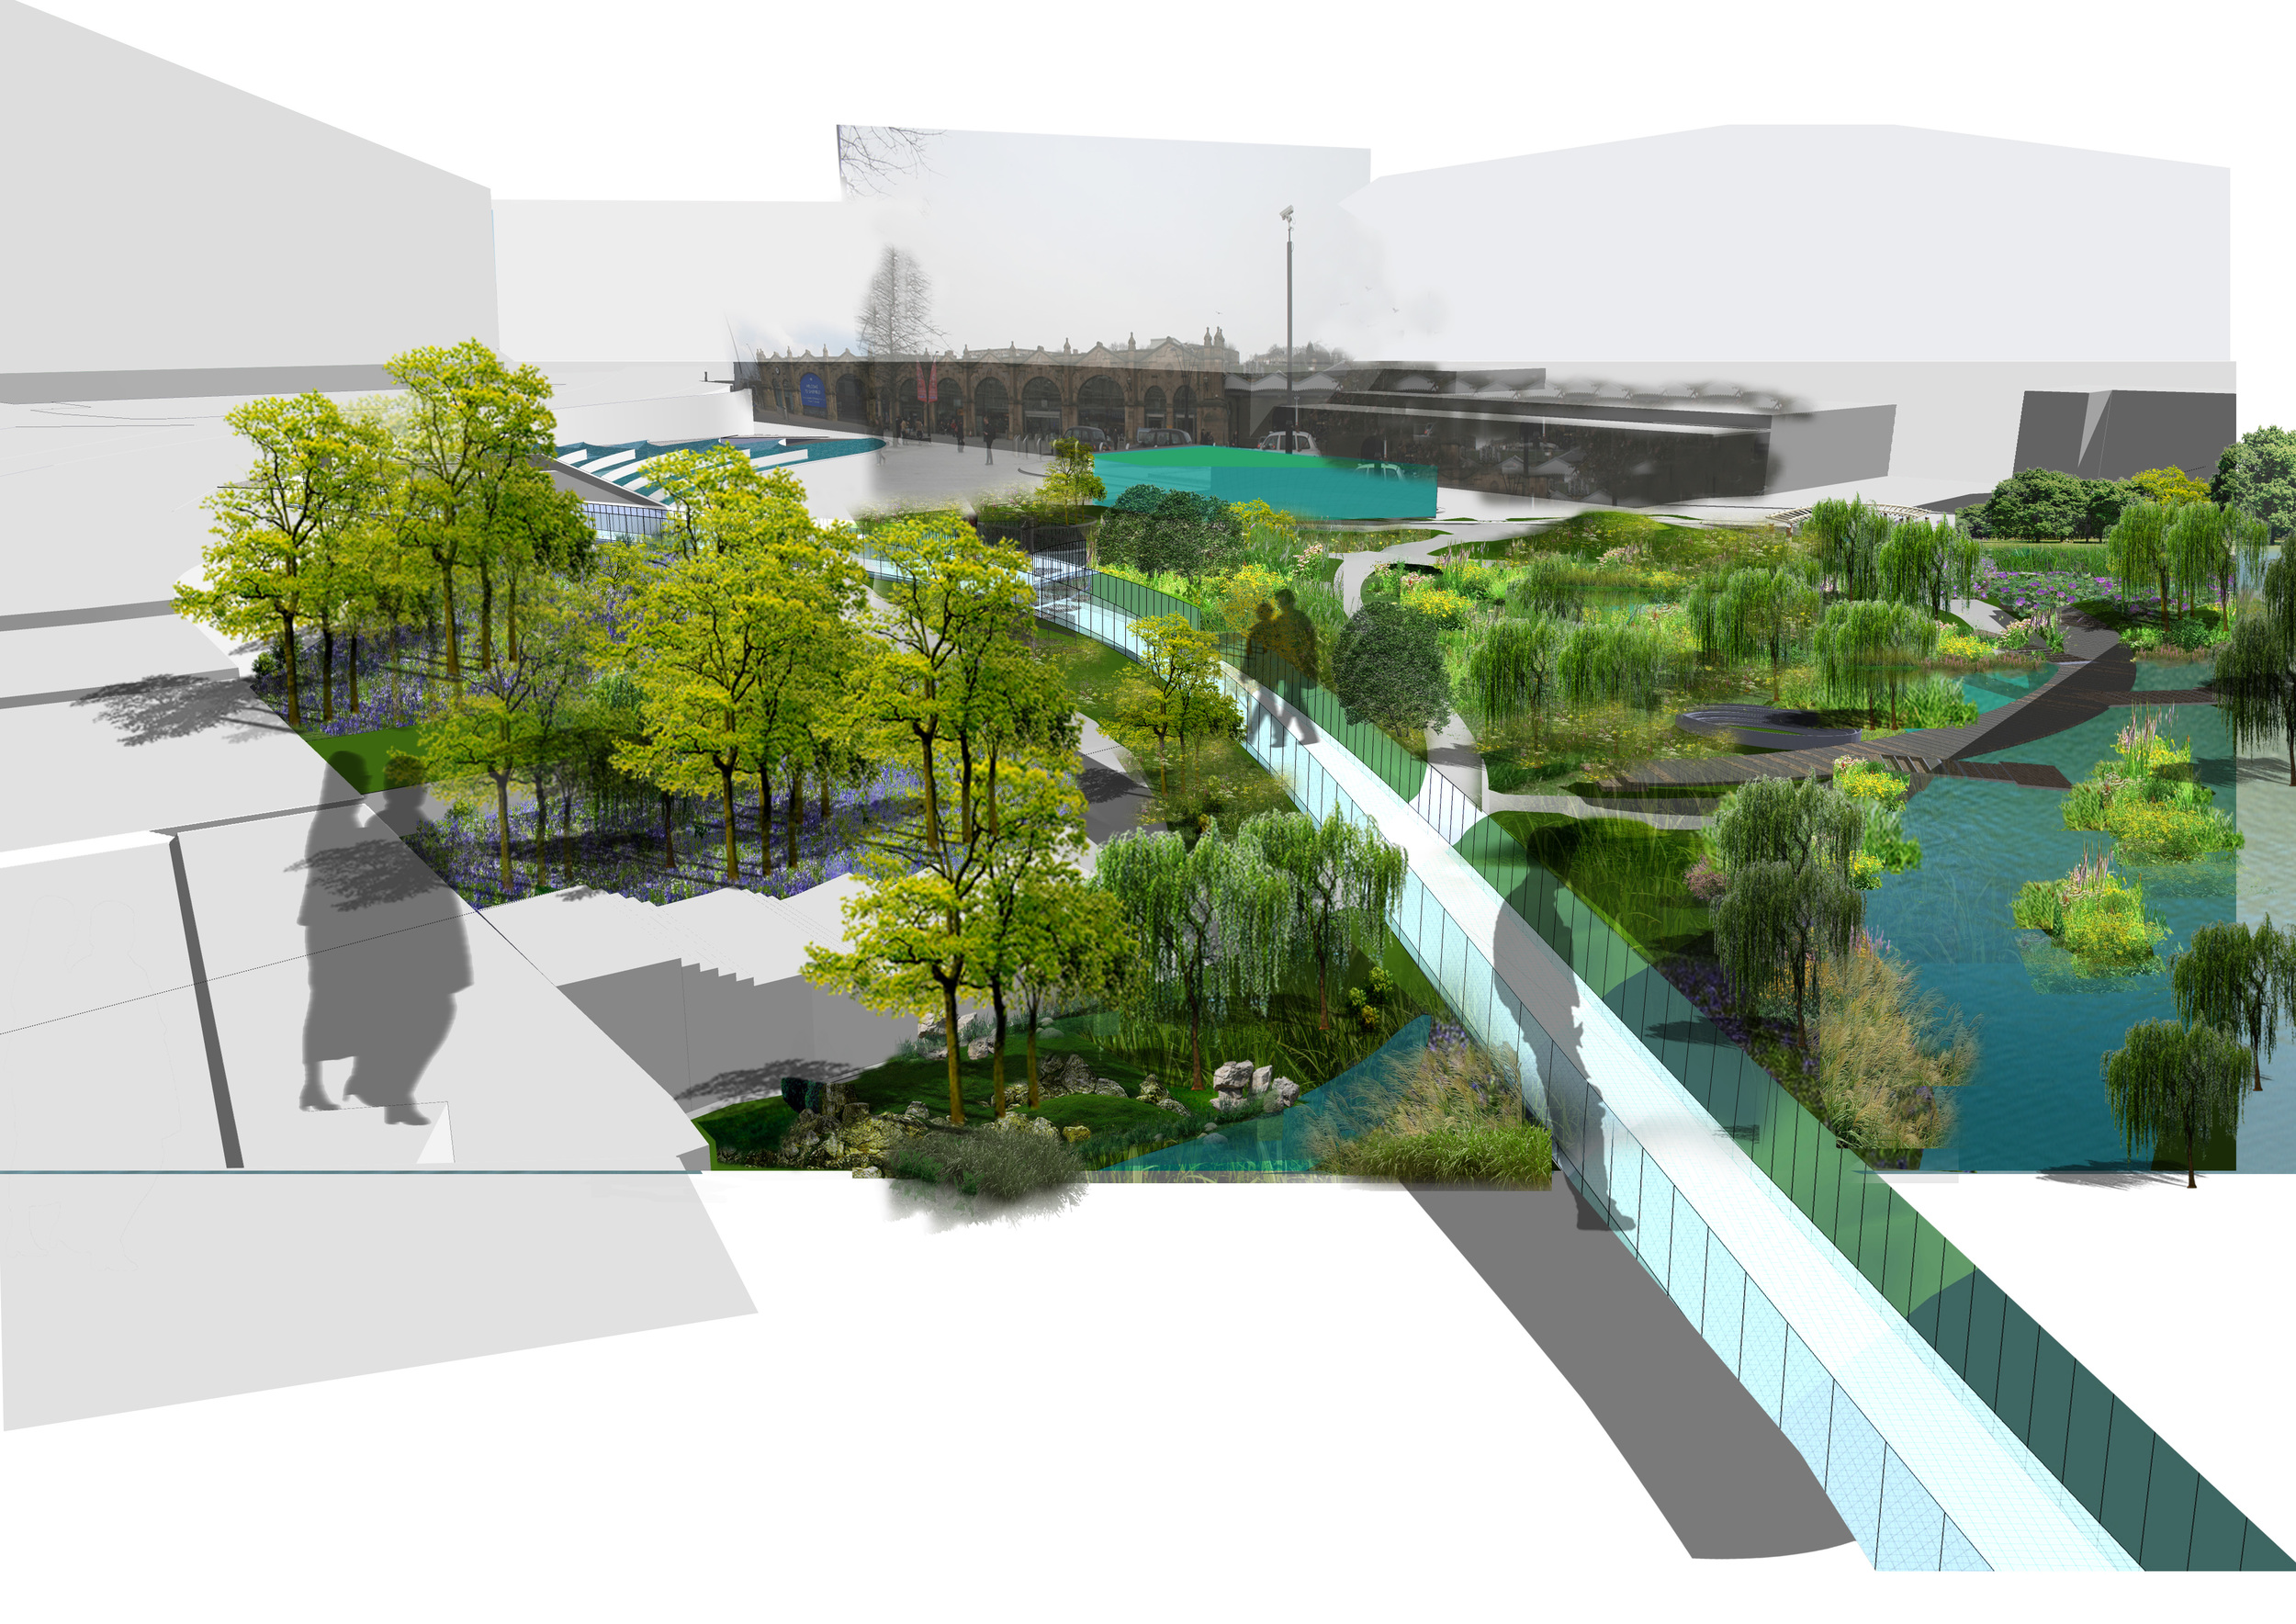 Sheaf Square Proposal Perspective-yanlishen